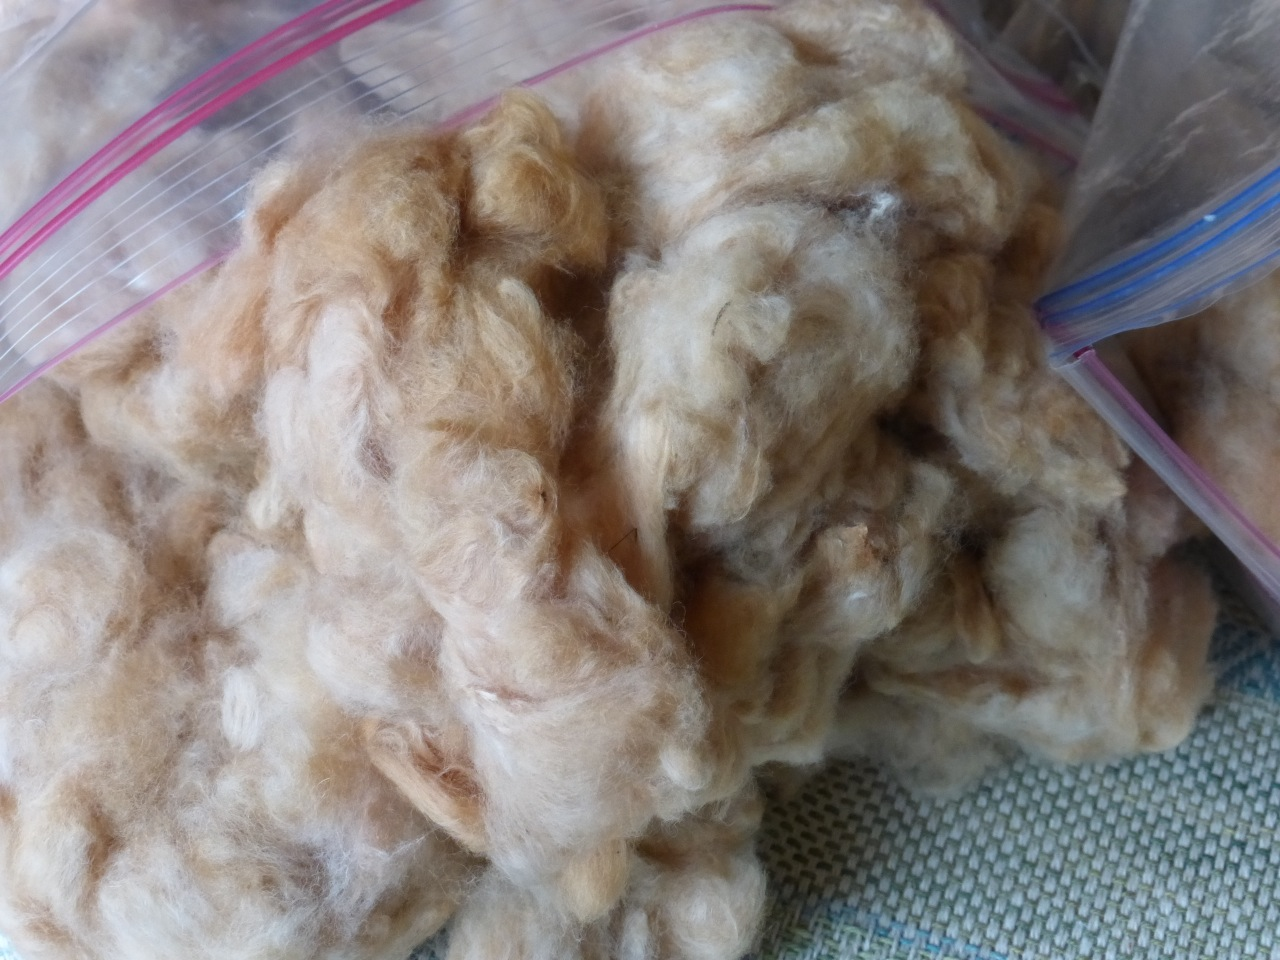 A bag full of Ecuadorean brown cotton. It has a thick texture.